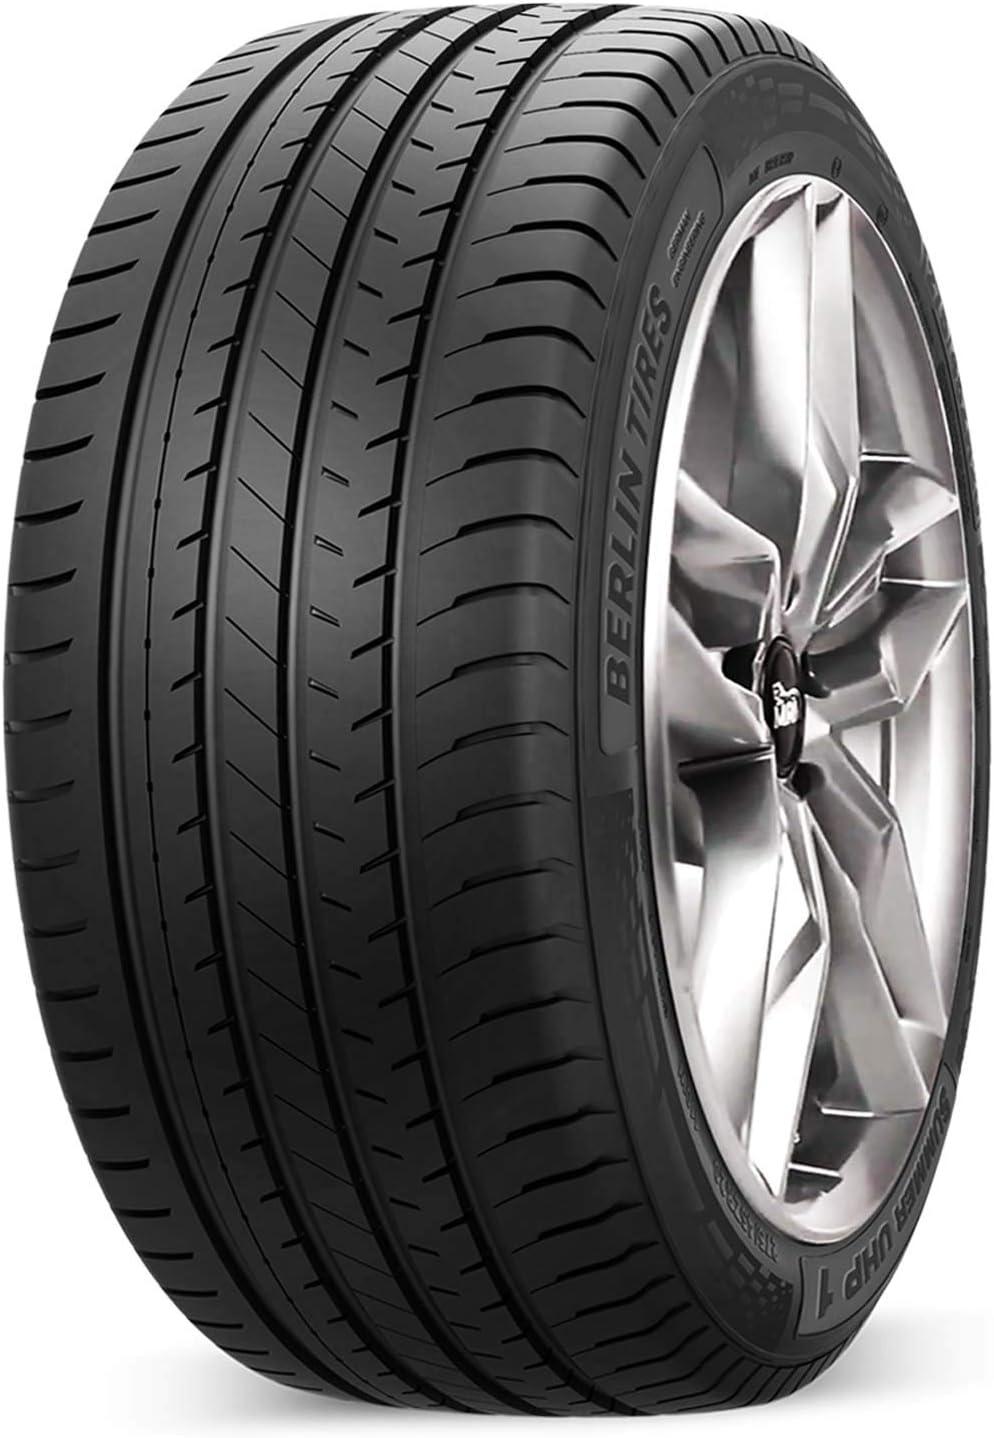 Berlin Tires Summer Uhp 1 Xl 225 55 R16 99 W B C 71db Sommerreifen Auto